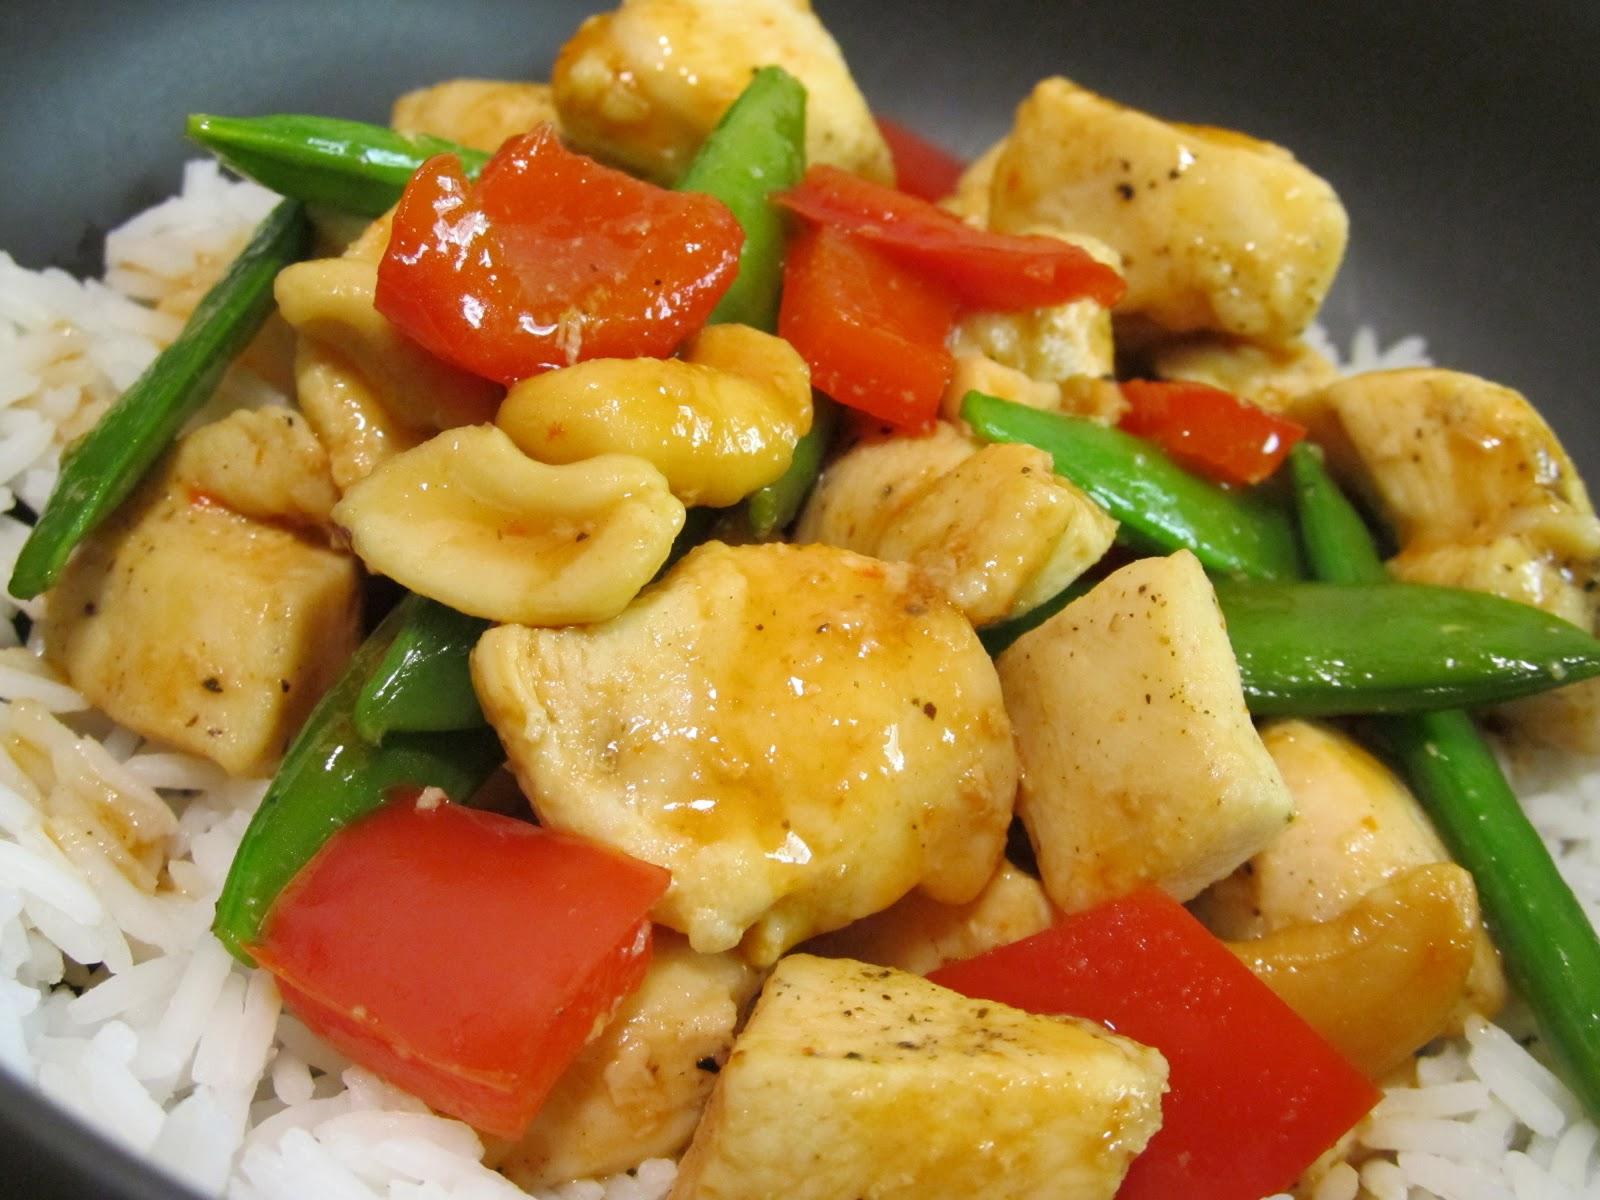 Jenn's Food Journey: Sriracha Honey Cashew Chicken